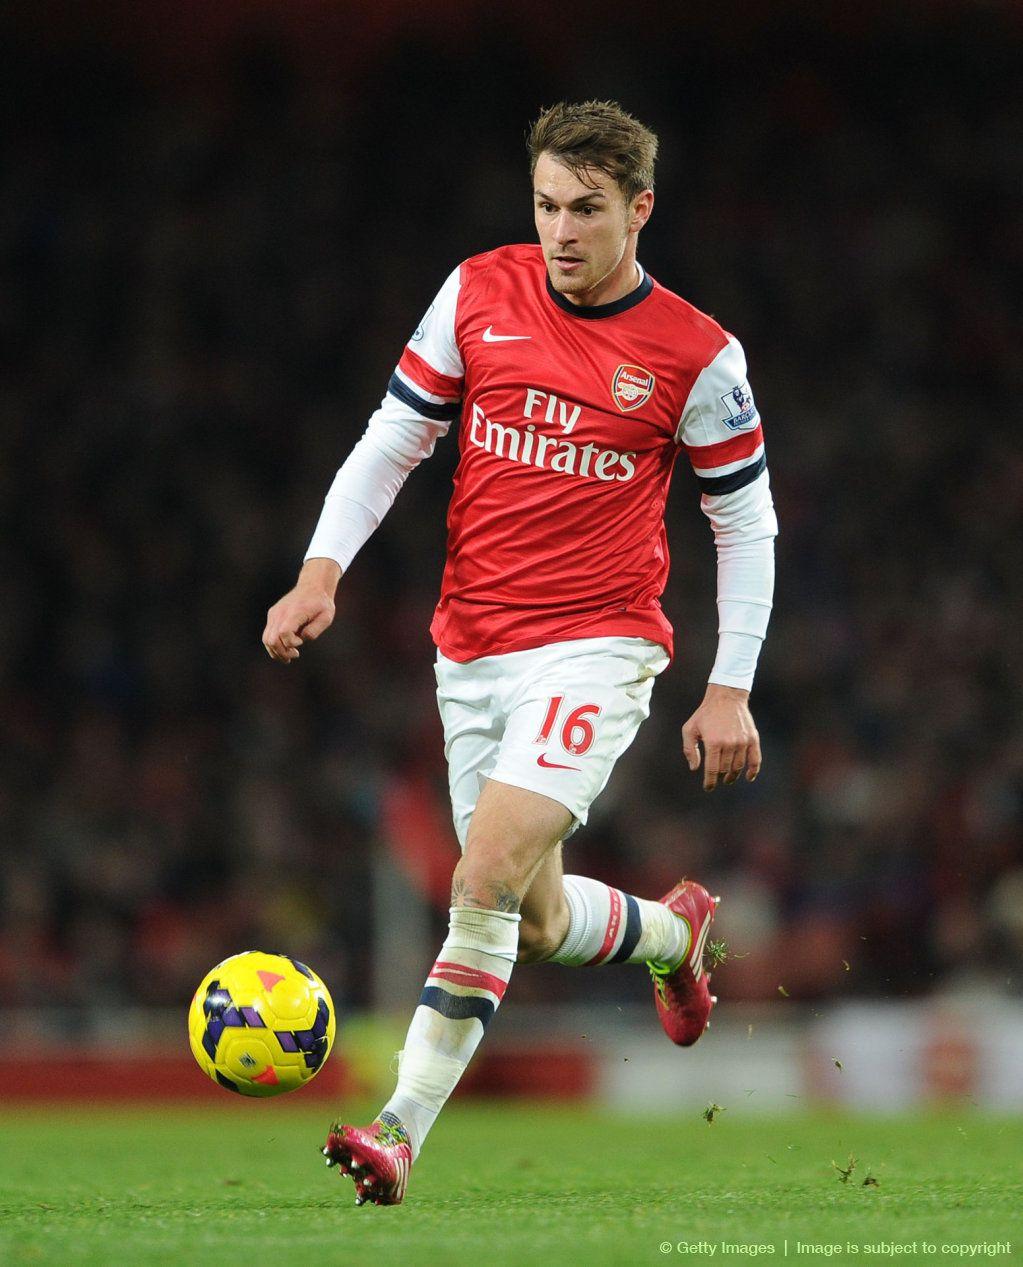 c89c88735e4 Aaron Ramsey Neymar, Messi, Arsenal Fc, Soccer Players, Manchester United,  Athletes